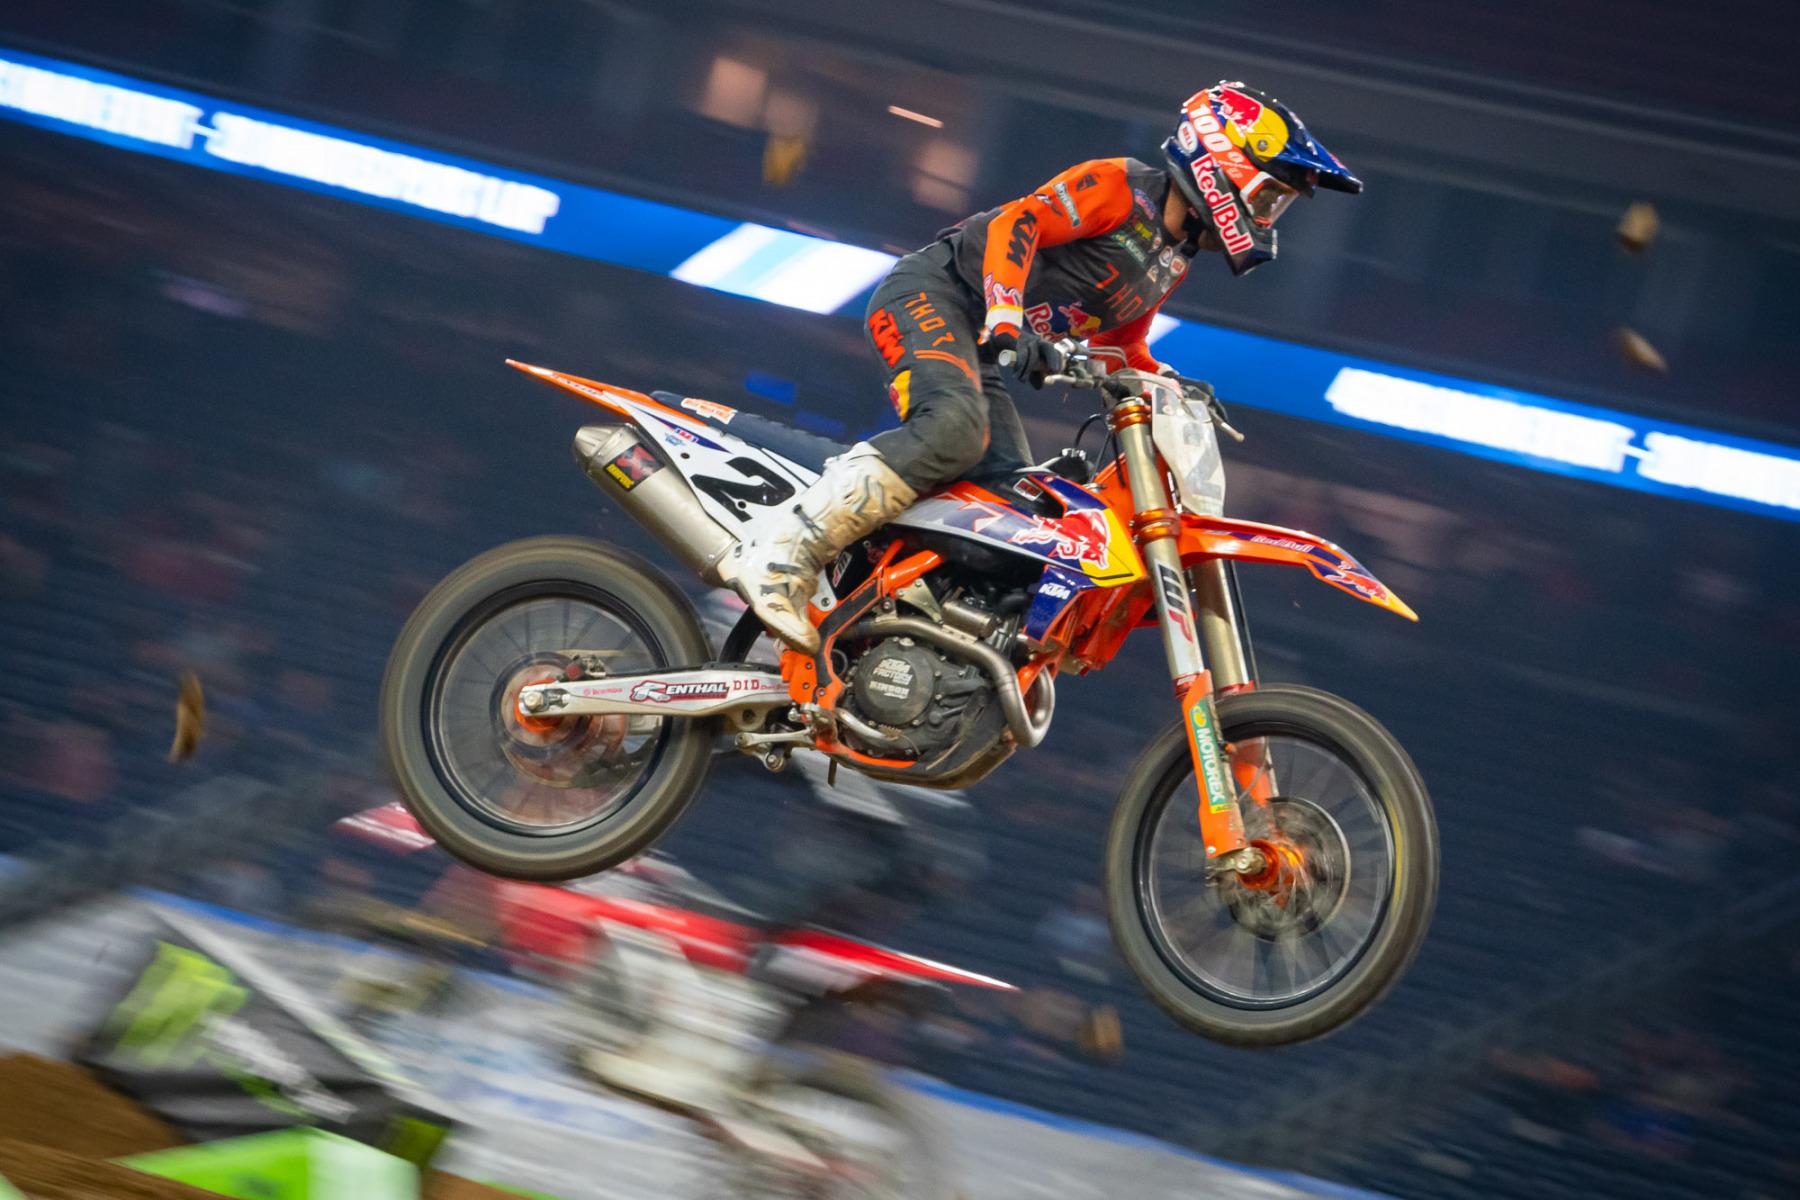 2021-Houston-Two-Supercross_Kickstart_0828